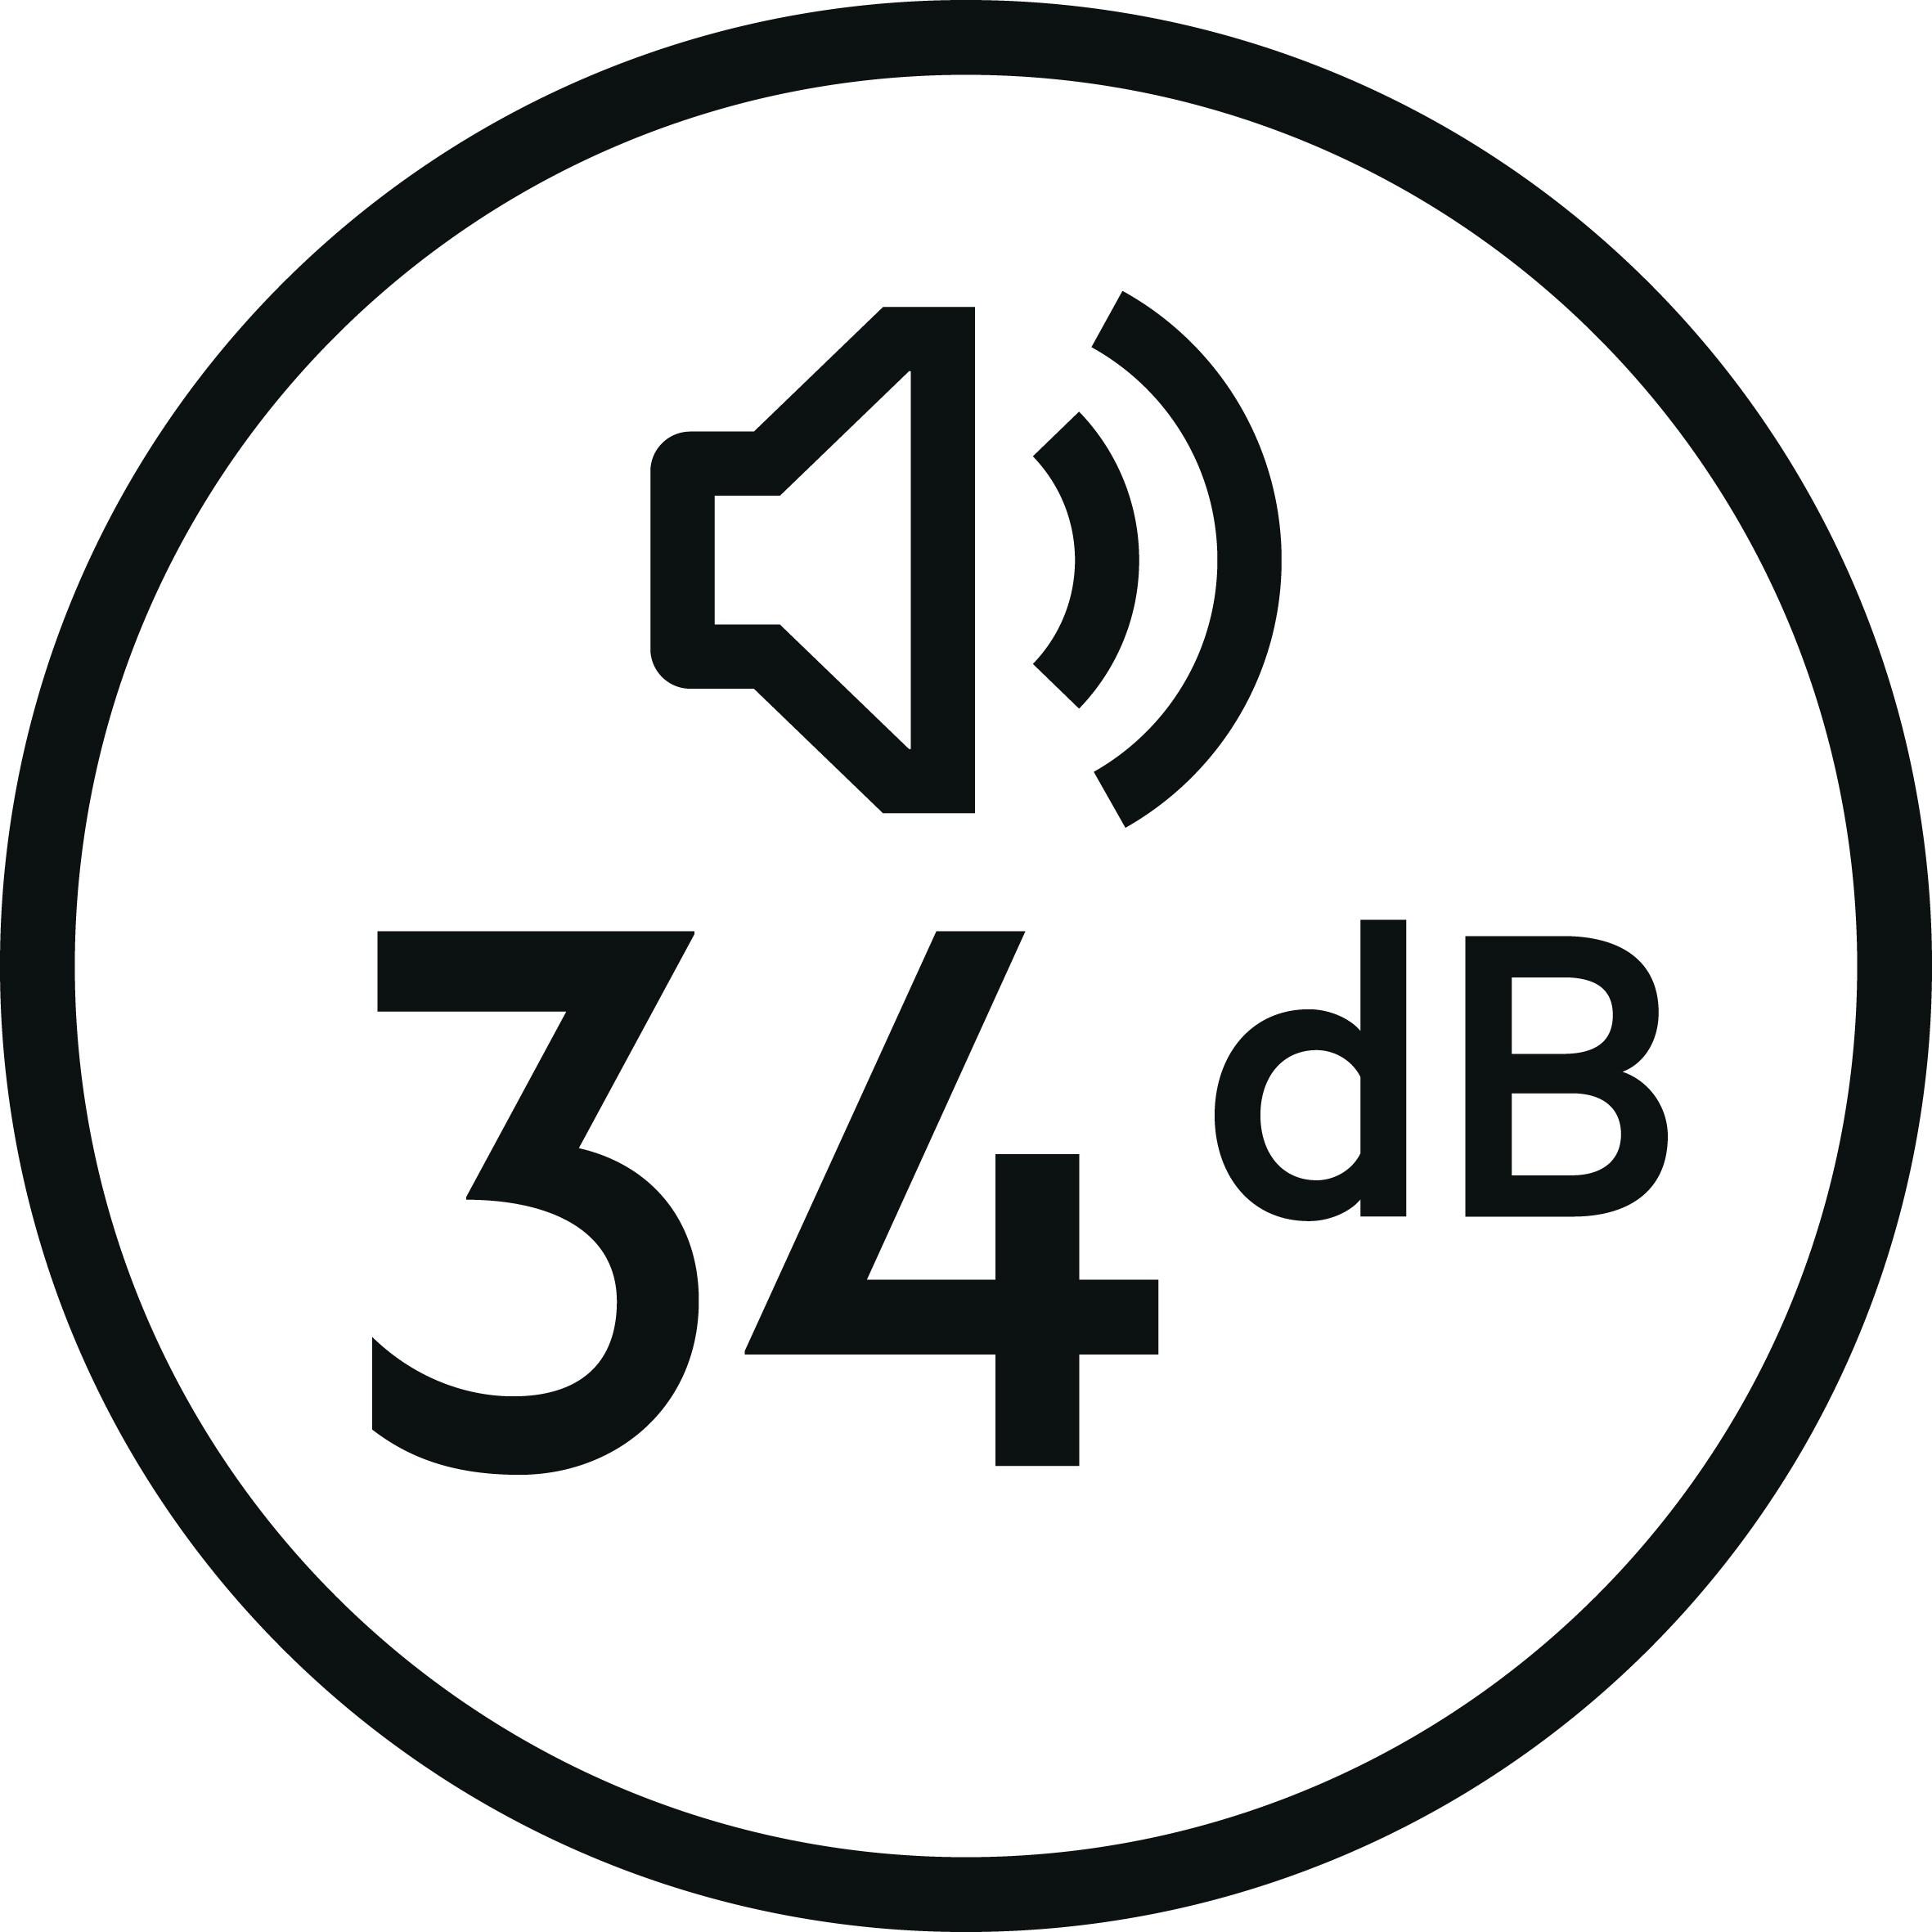 34dB-PSAAAP16PC569057.jpg